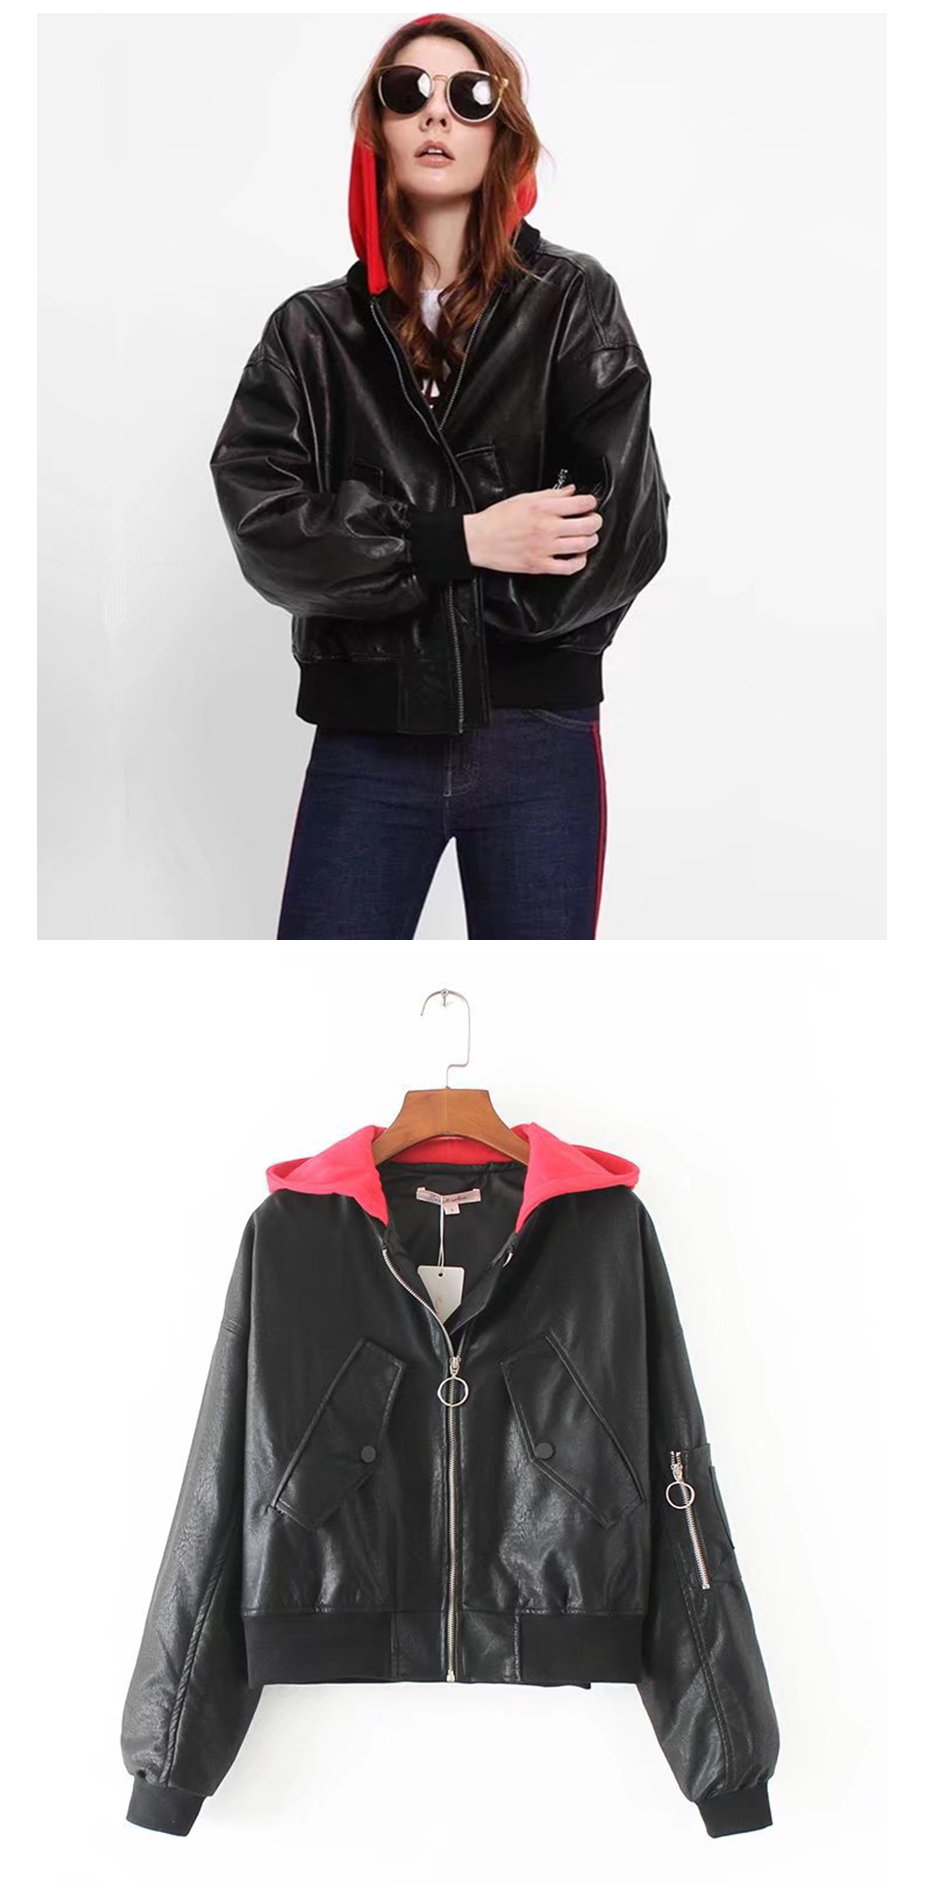 Gaovot hoodie pilot faux black women leather jacket ladies moto coat woman gothic biker jacket womens winter jackets (2)